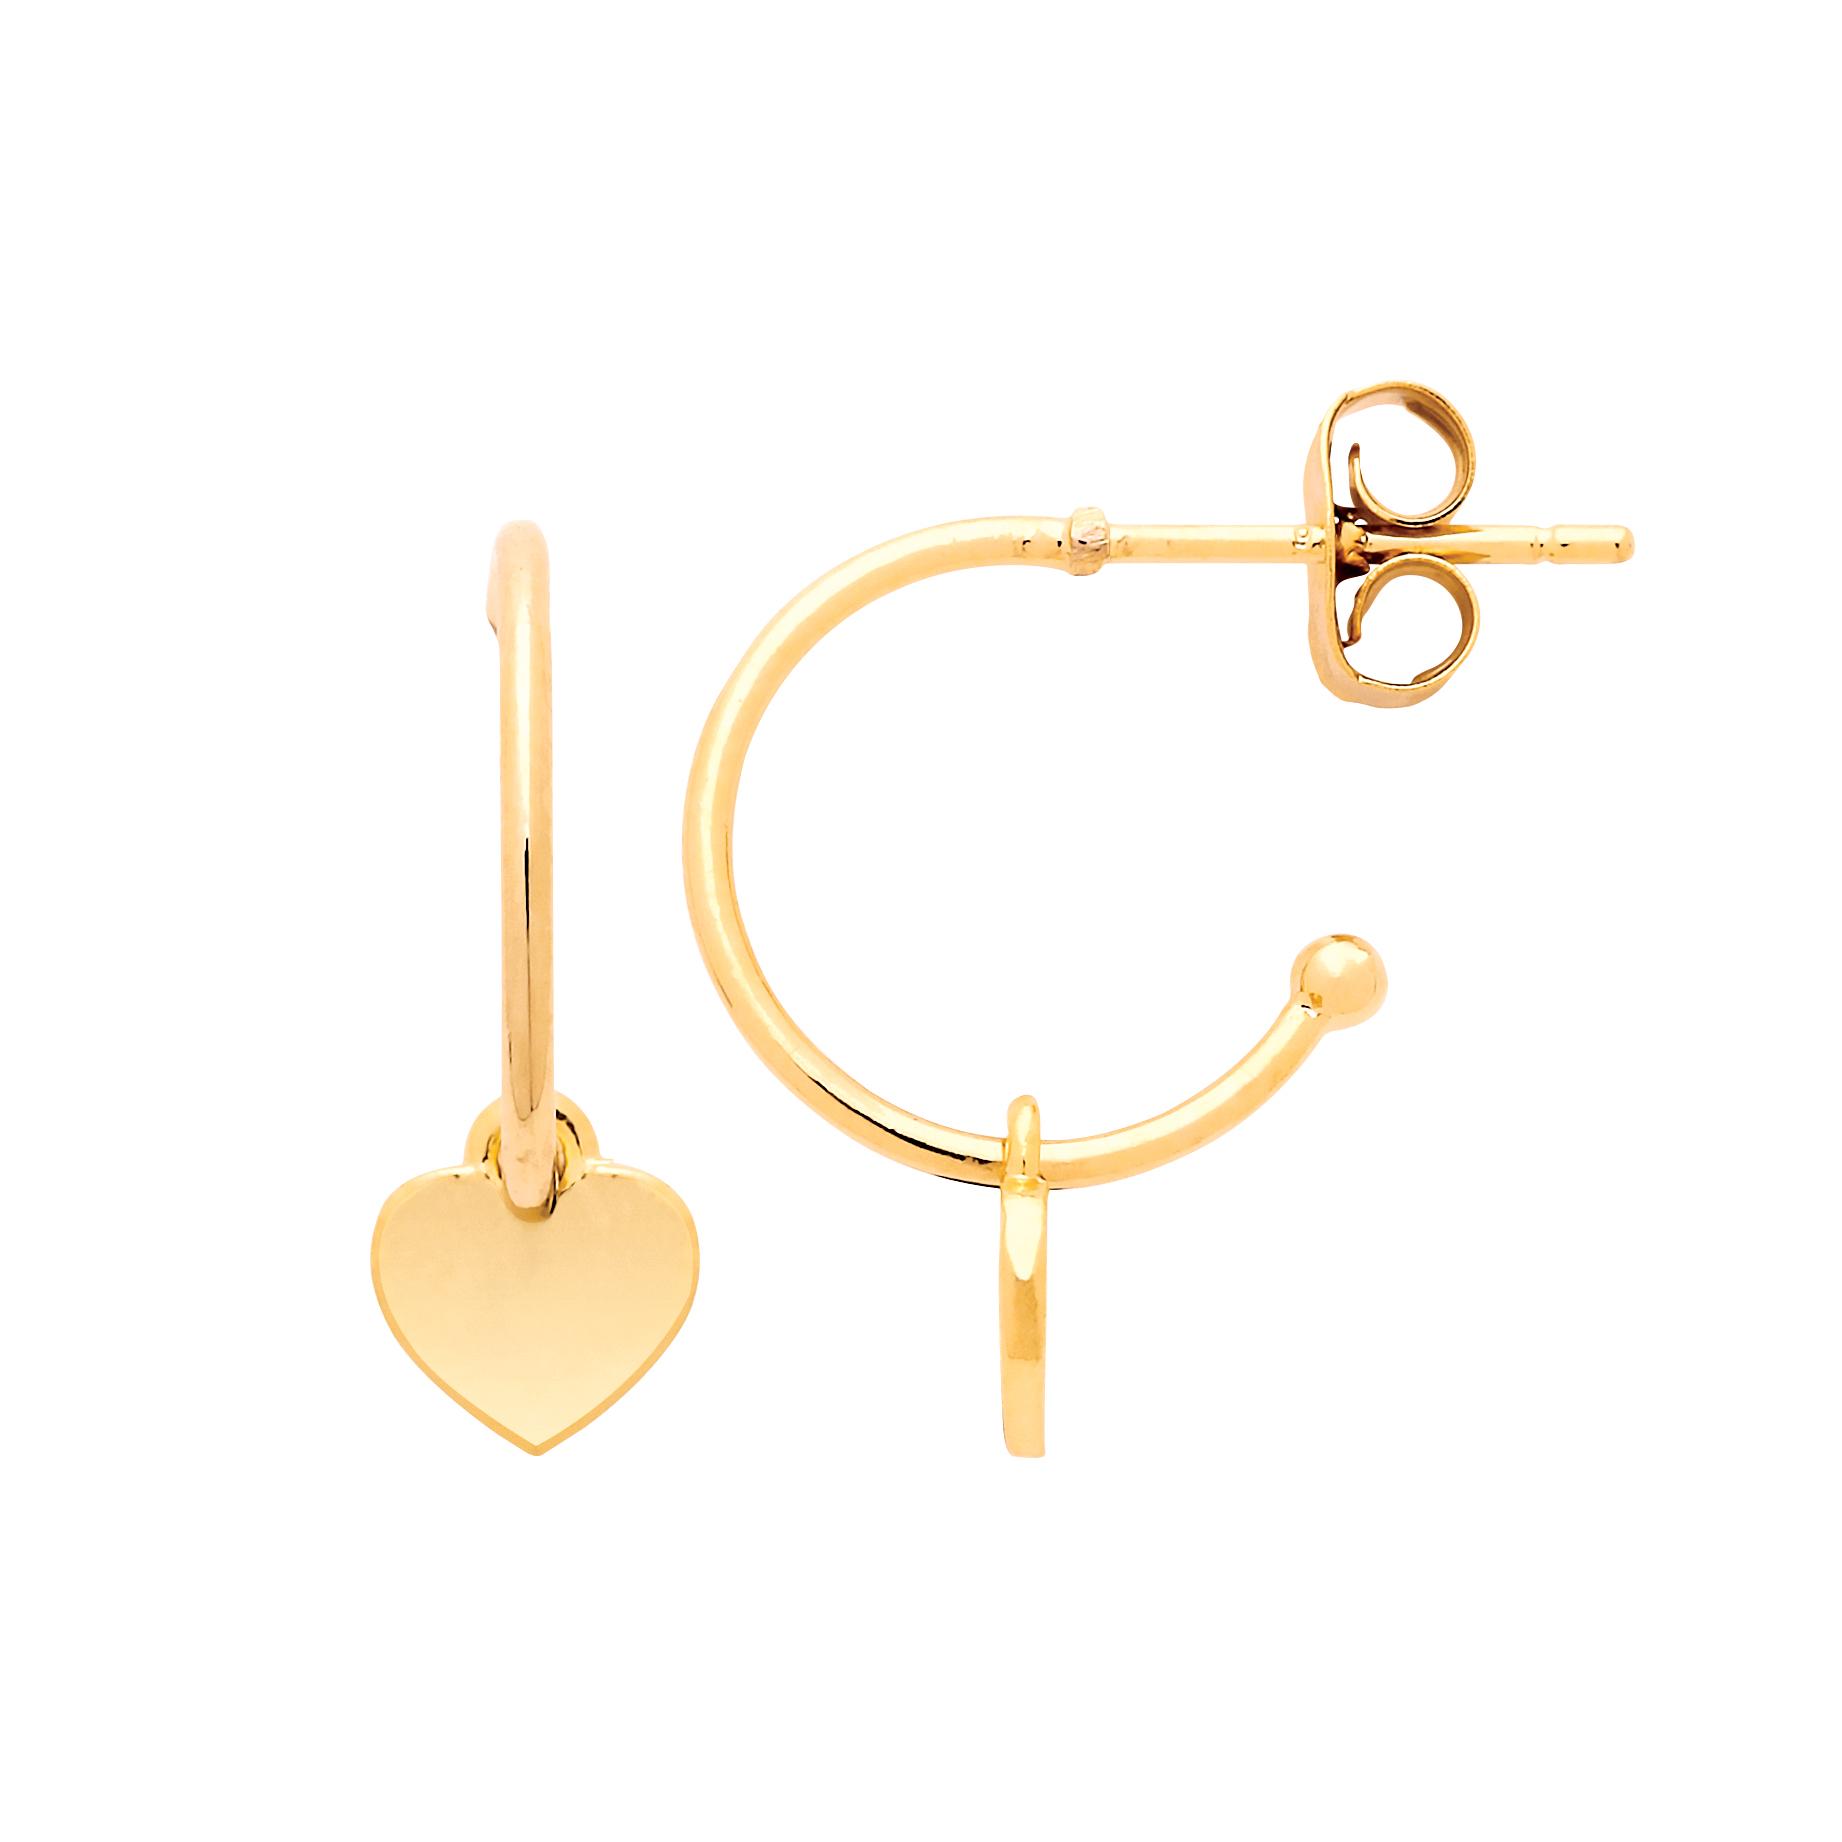 Estella Bartlett - Heart Drop Hoop Earrings Gold Plated Np